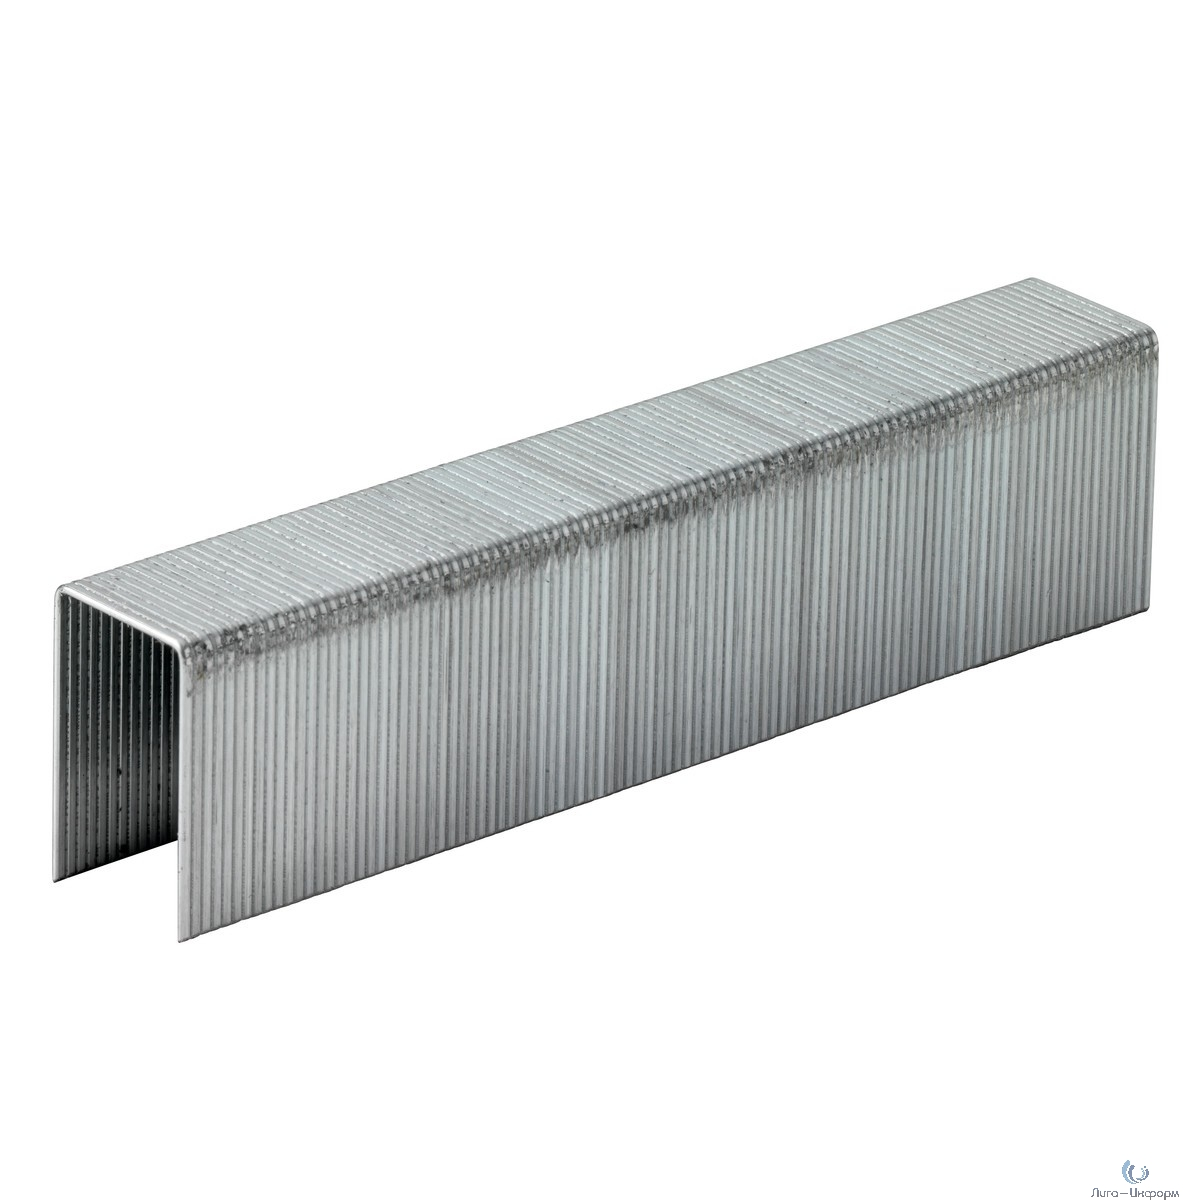 Metabo Скобы, ширина 10 мм, длина 14 мм (1000 шт.) [630573000]